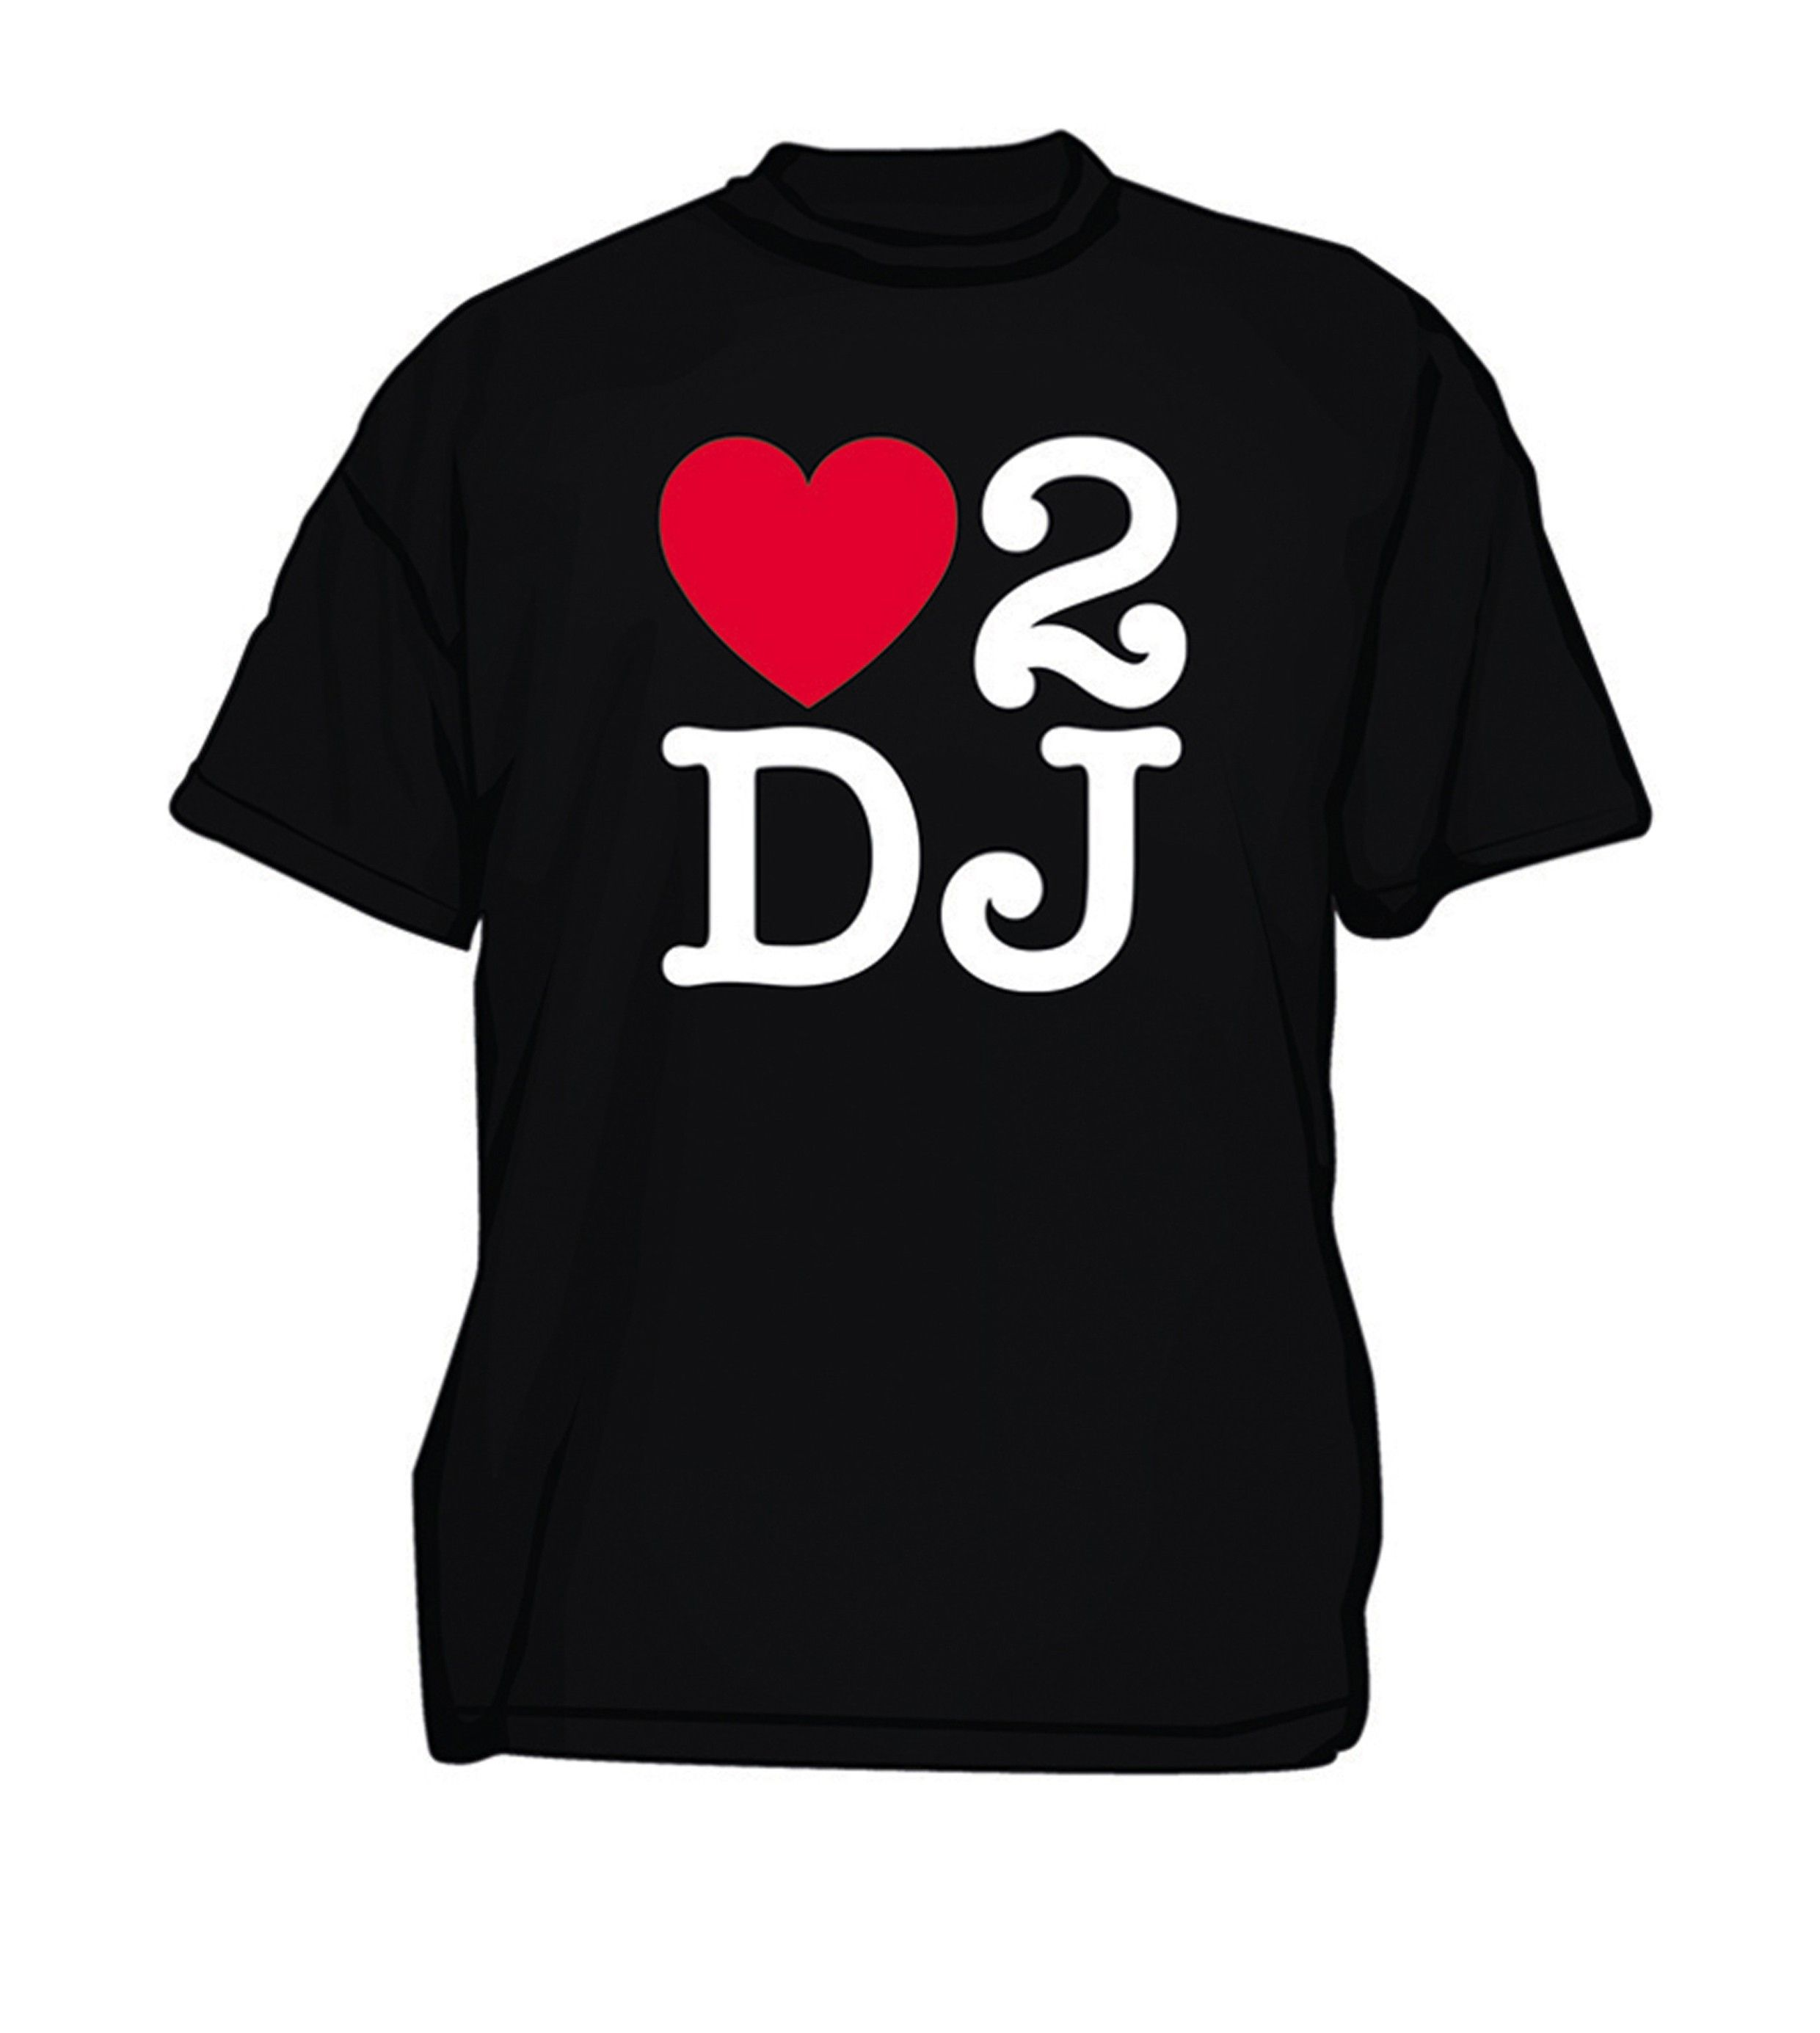 T shirt design jonesboro ar - Love To Dj Shirt T Shirts